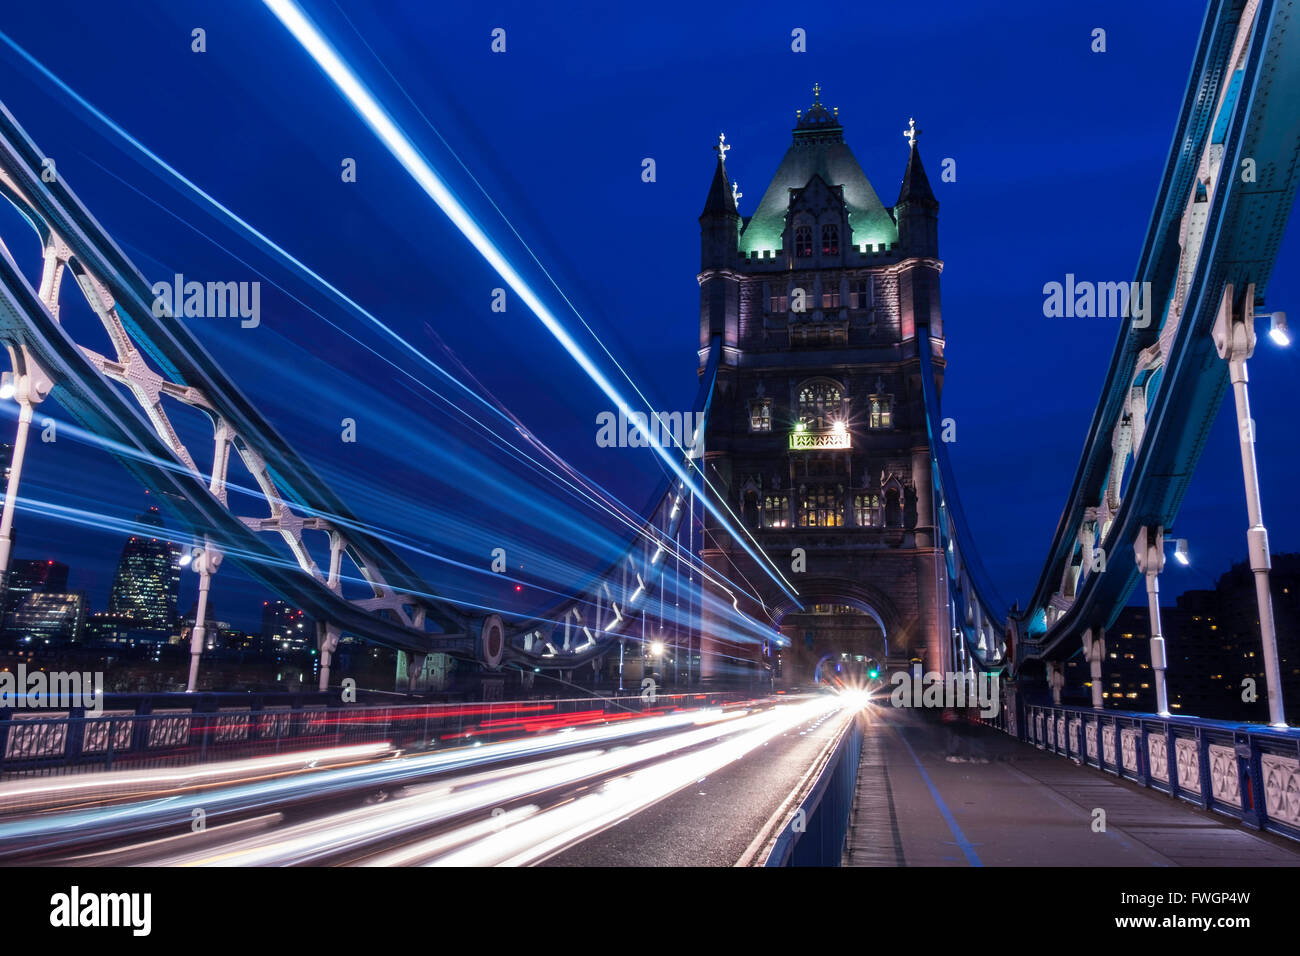 Light trails on London bridge in the evening, London, United Kingdom, Europe - Stock Image